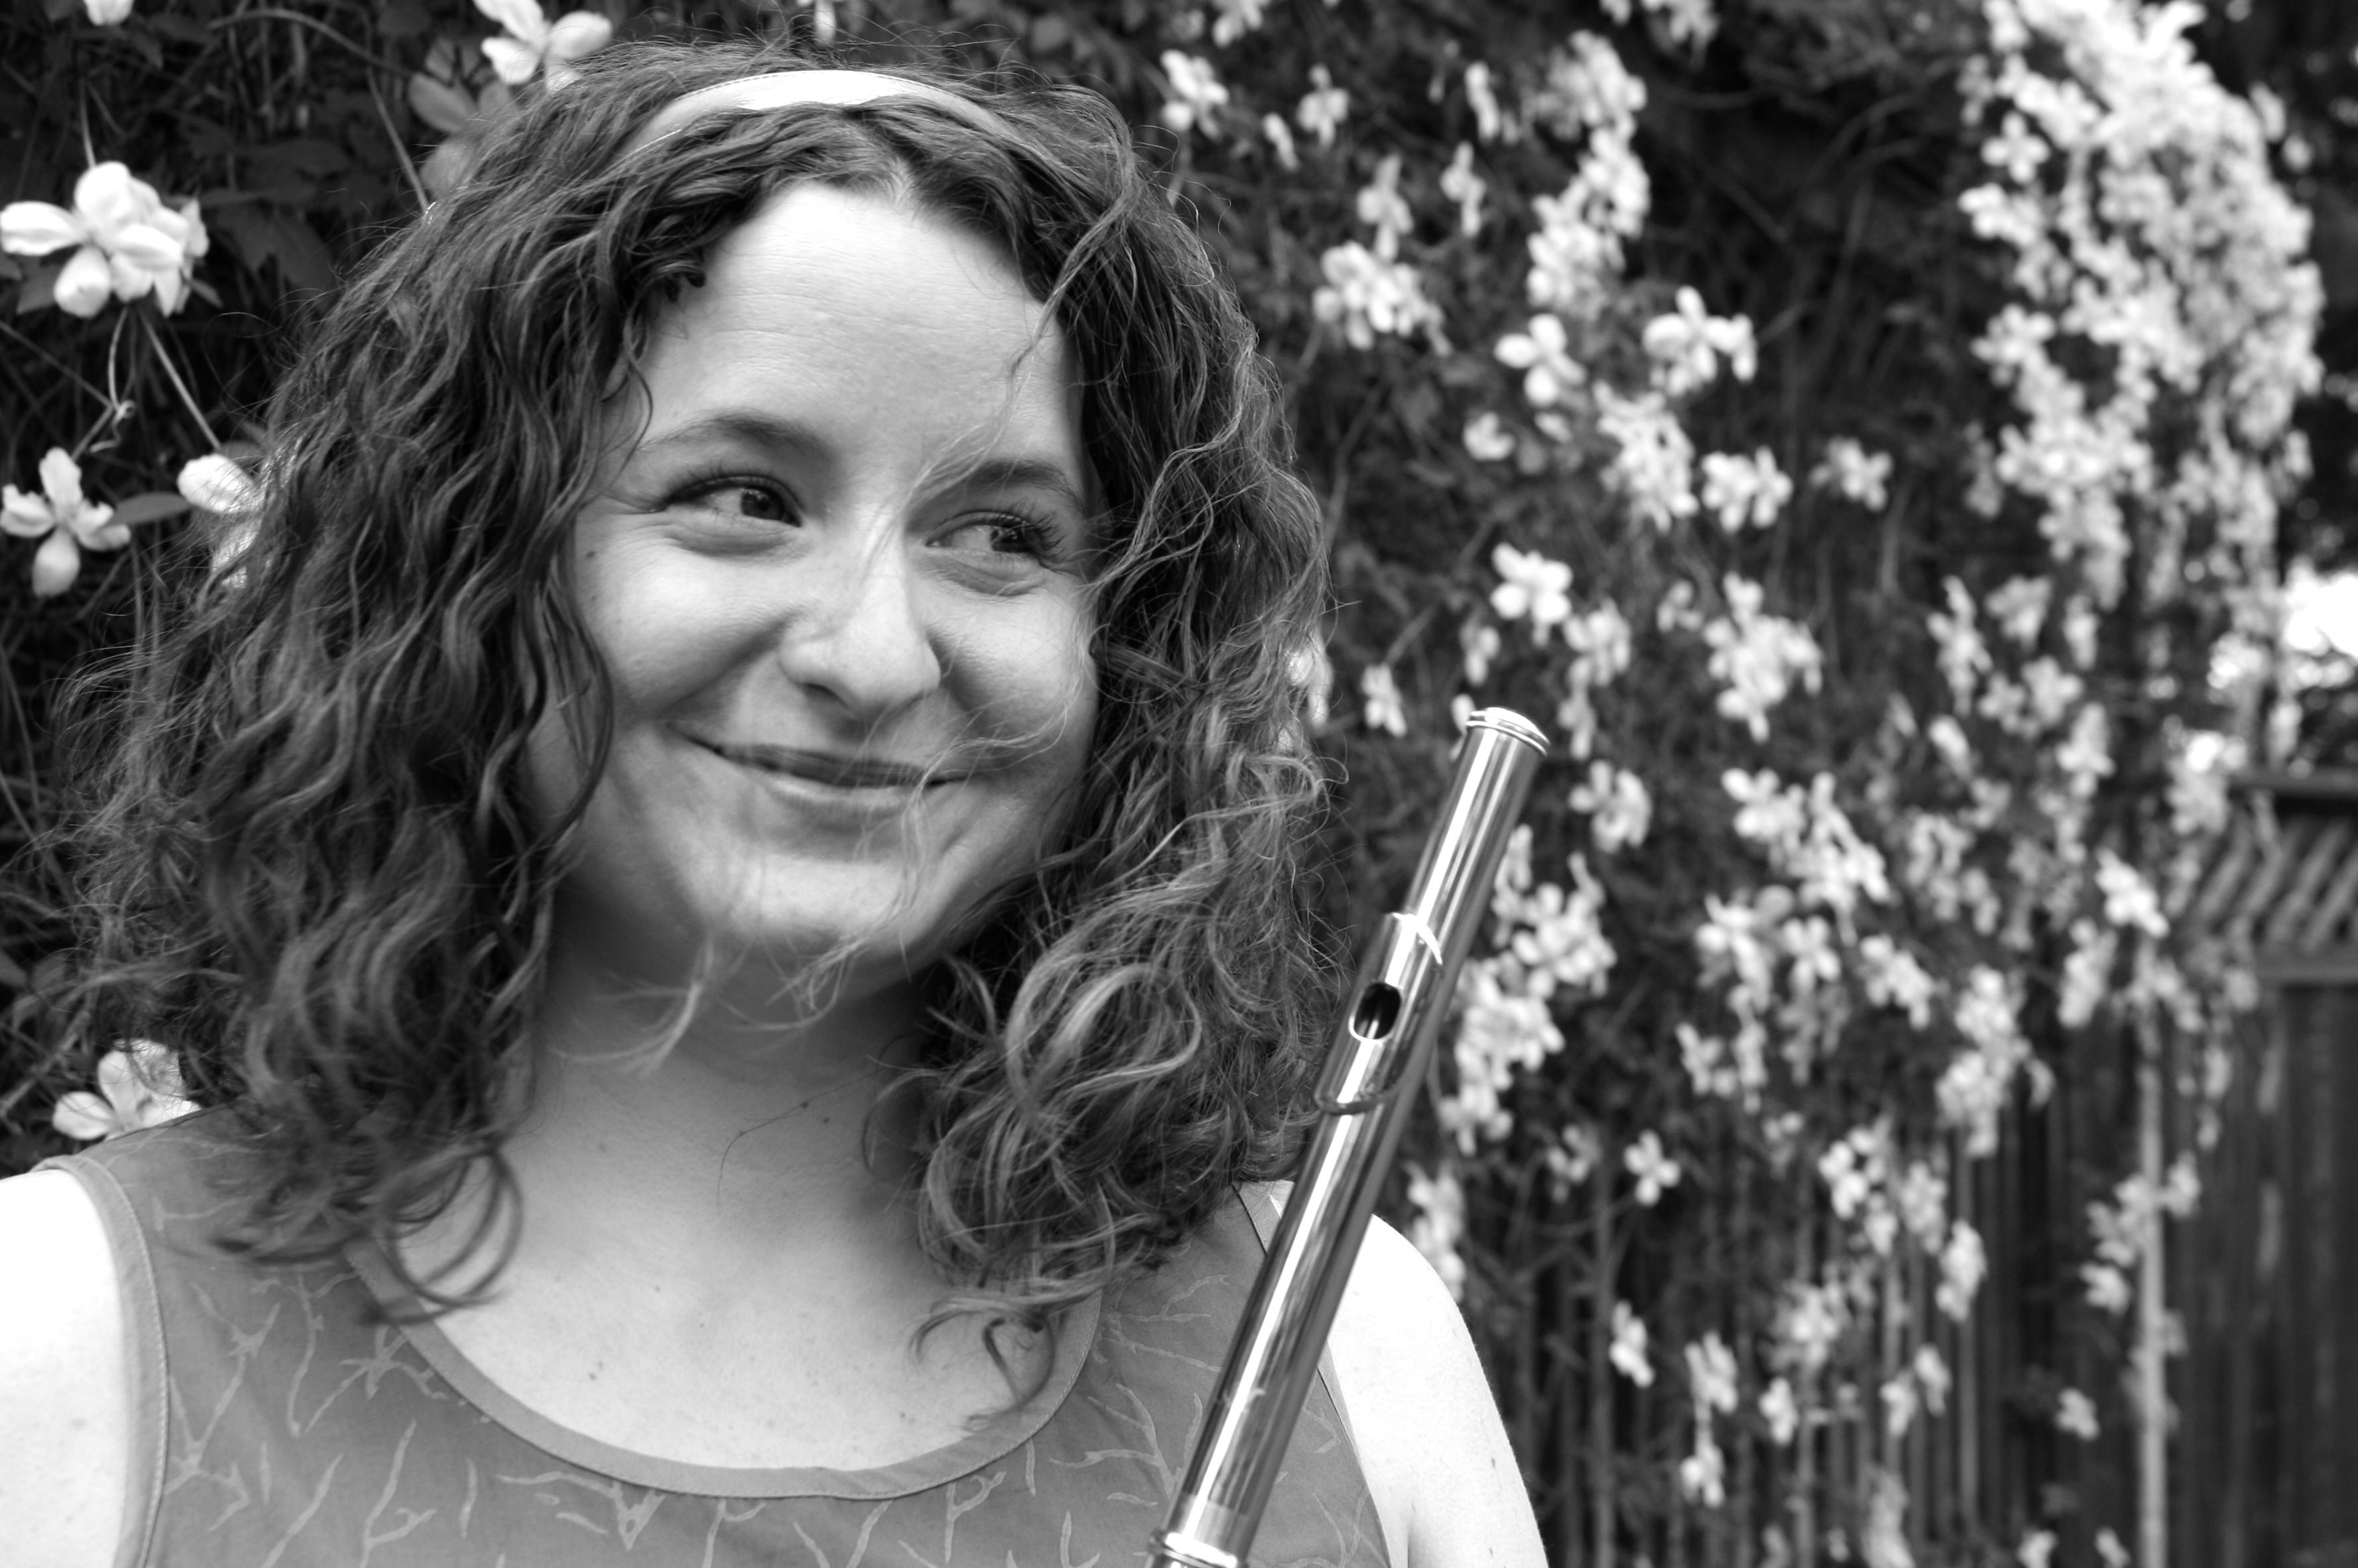 celine-thackston-flute